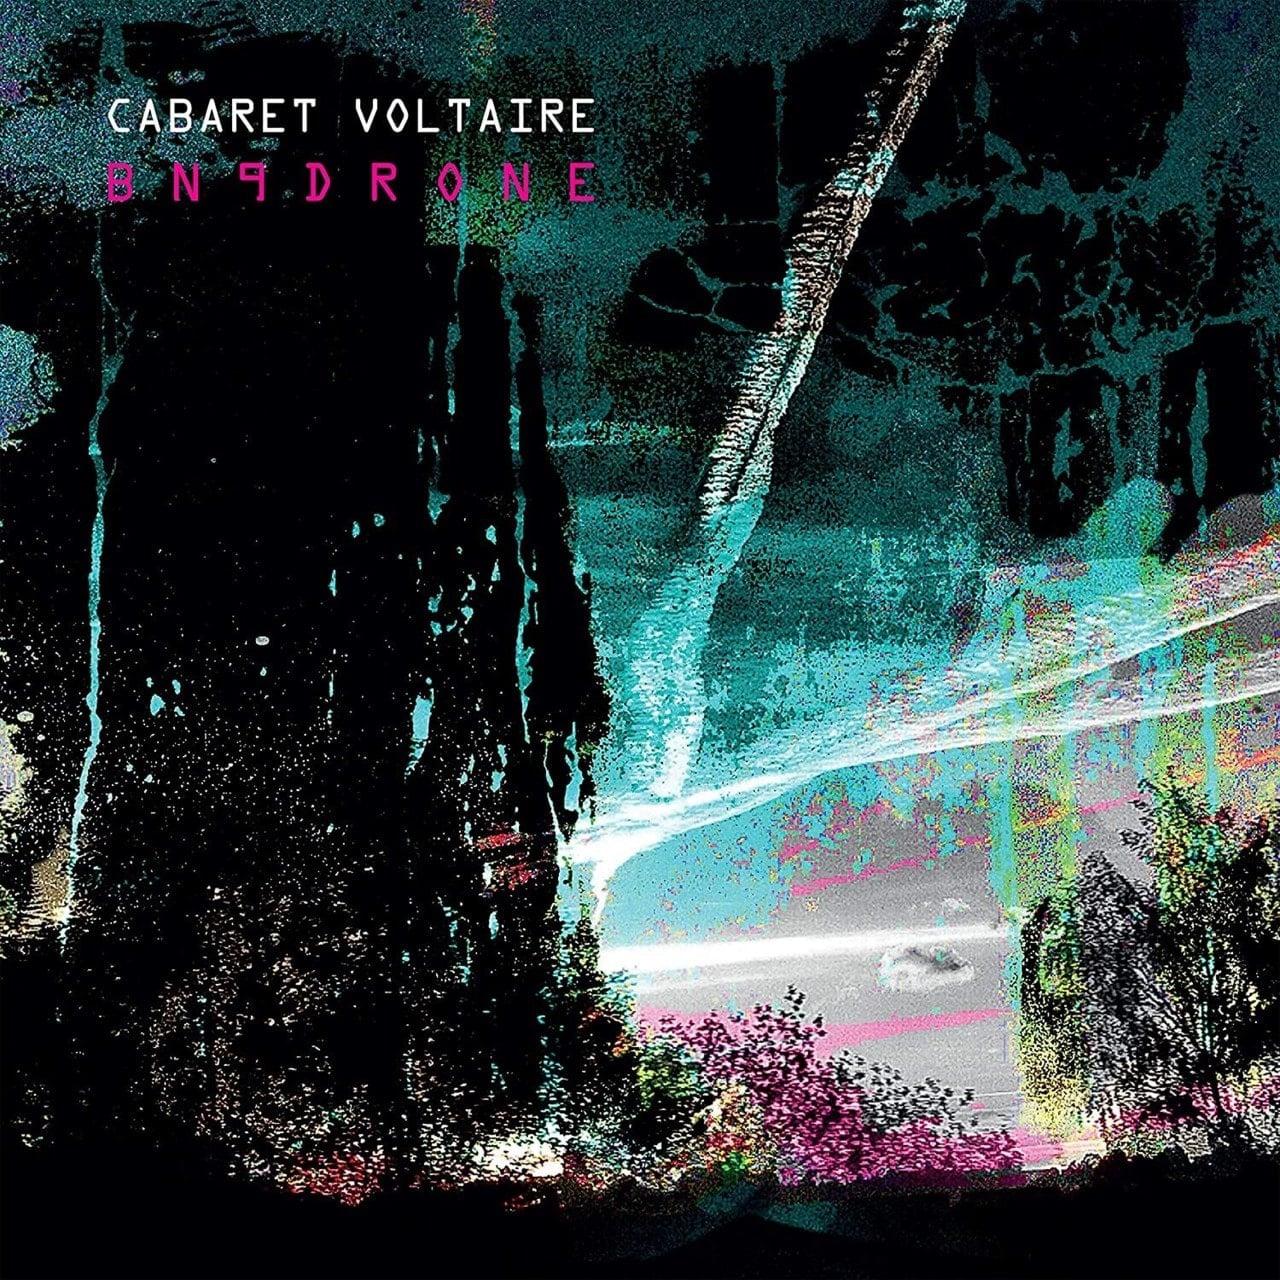 CABARET VOLTAIRE - BN9DRONE